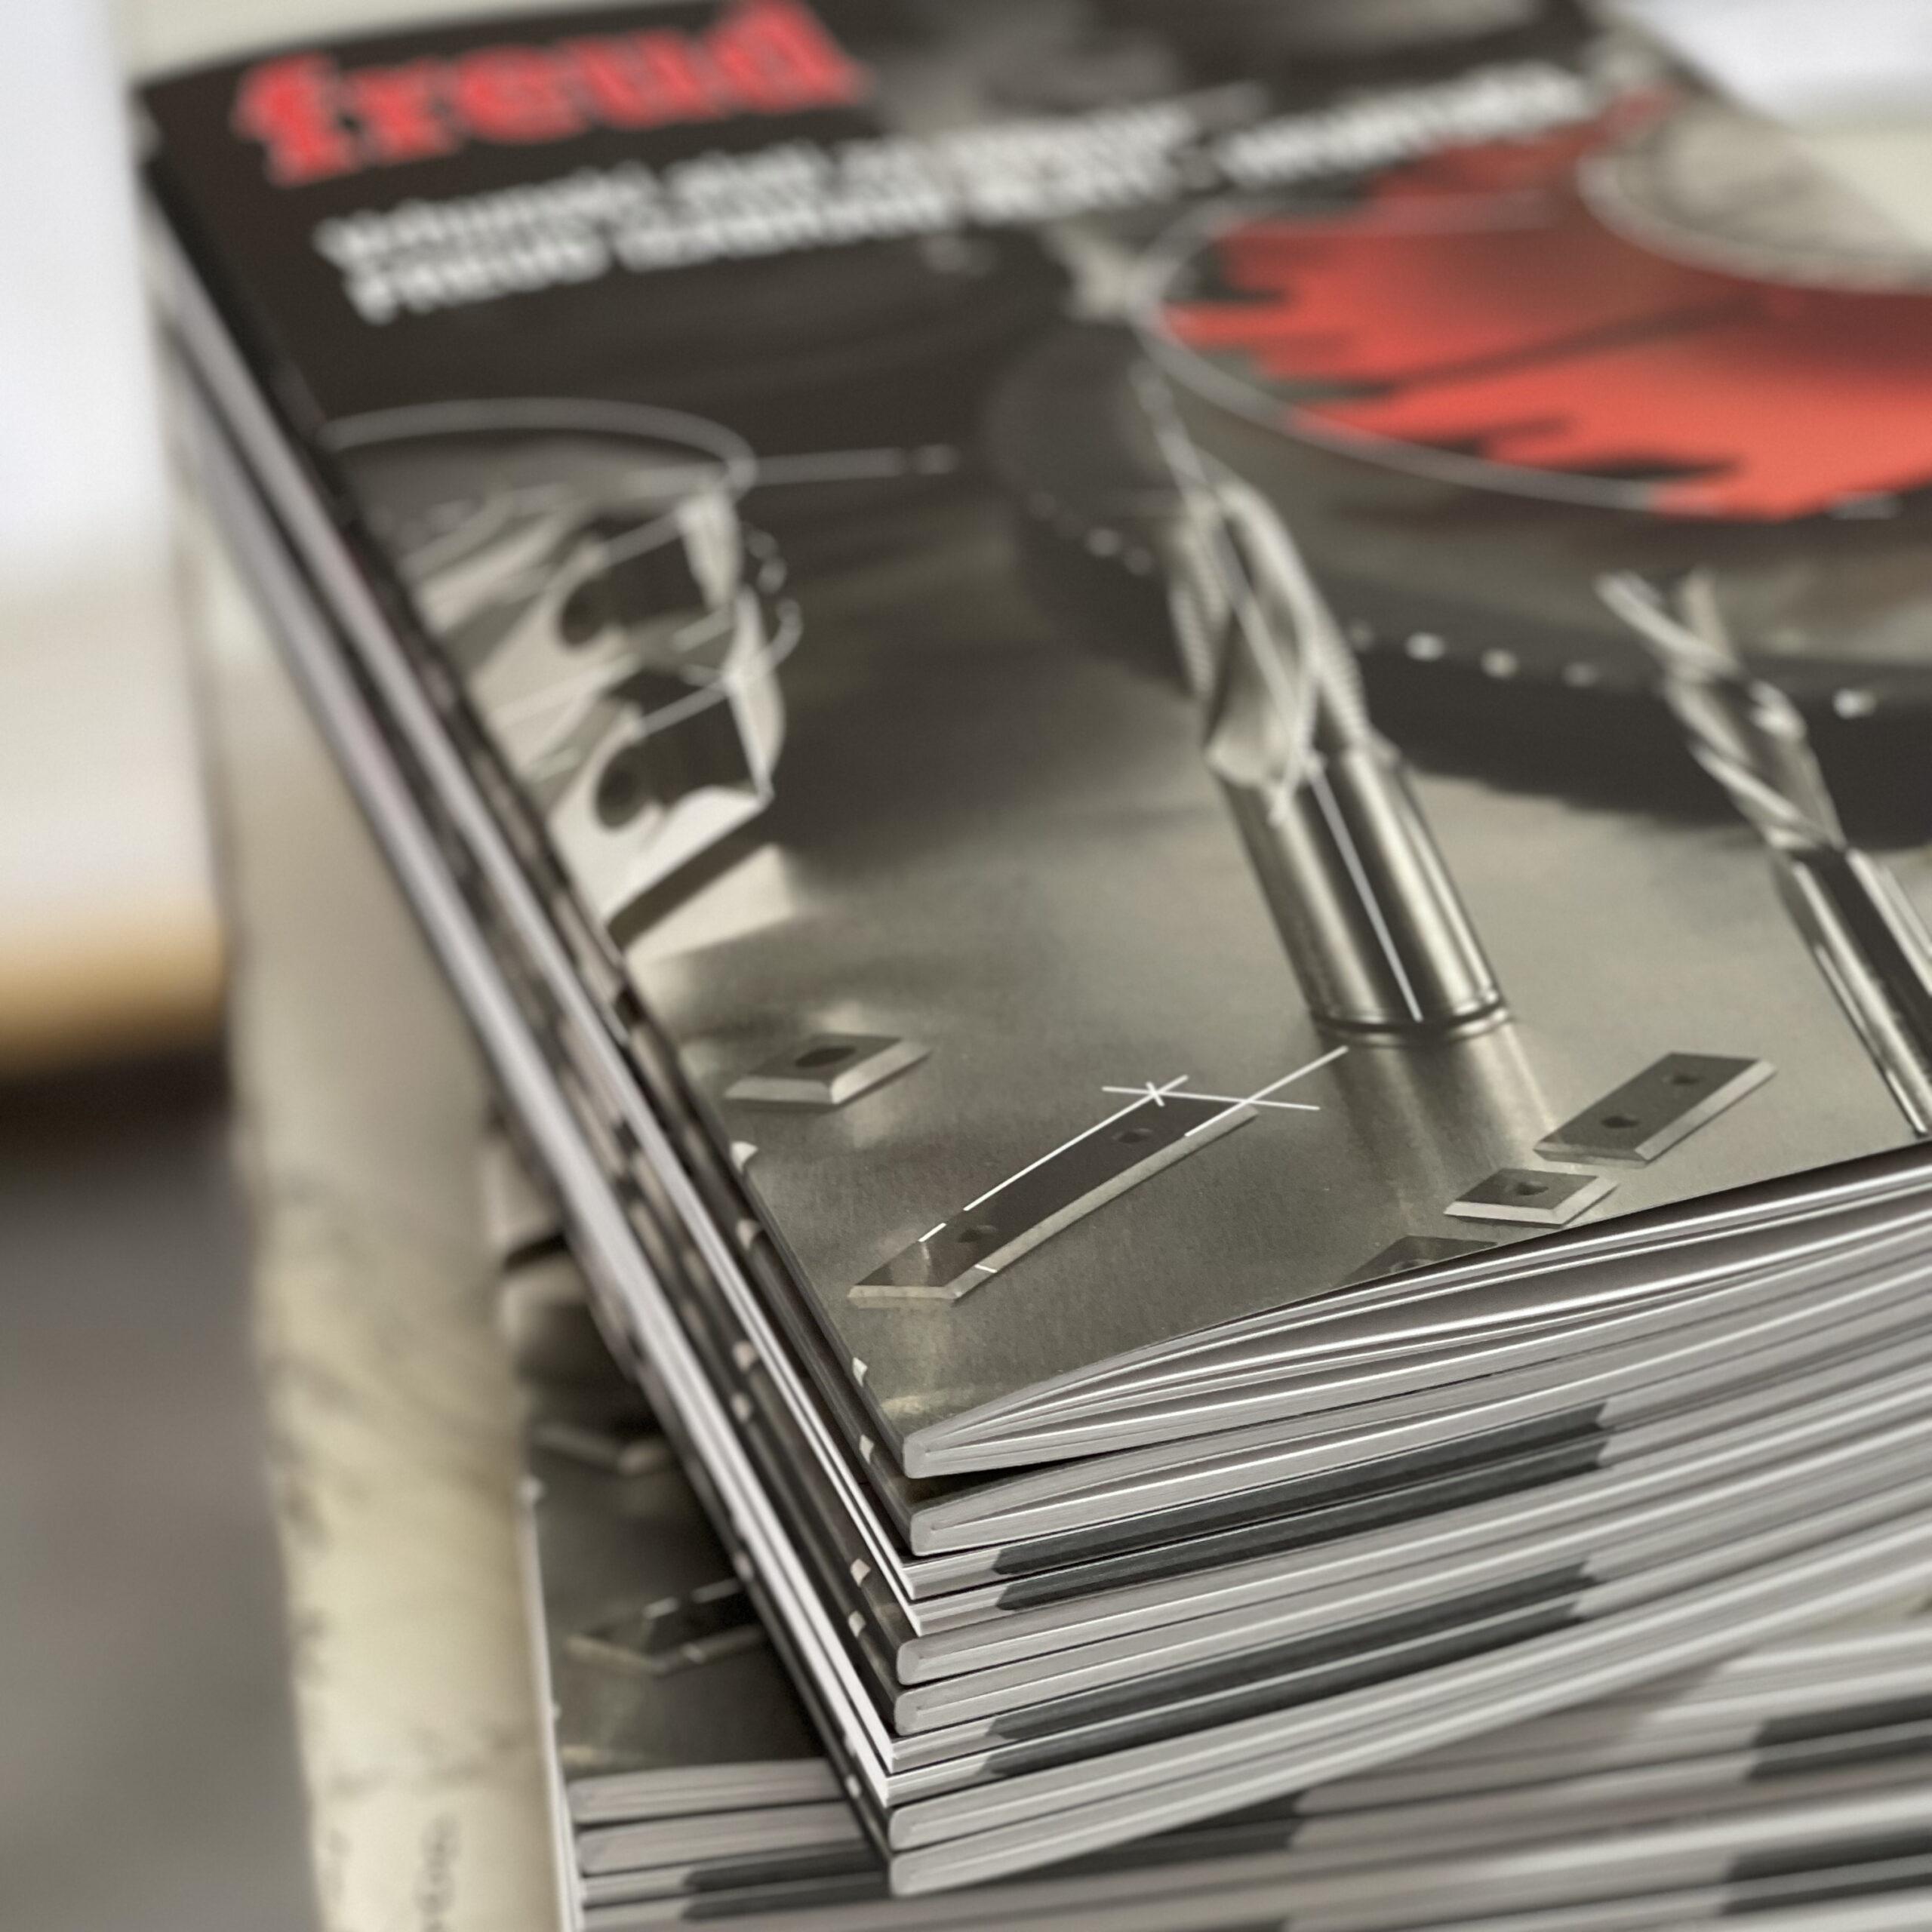 Square klamani uvez časopis